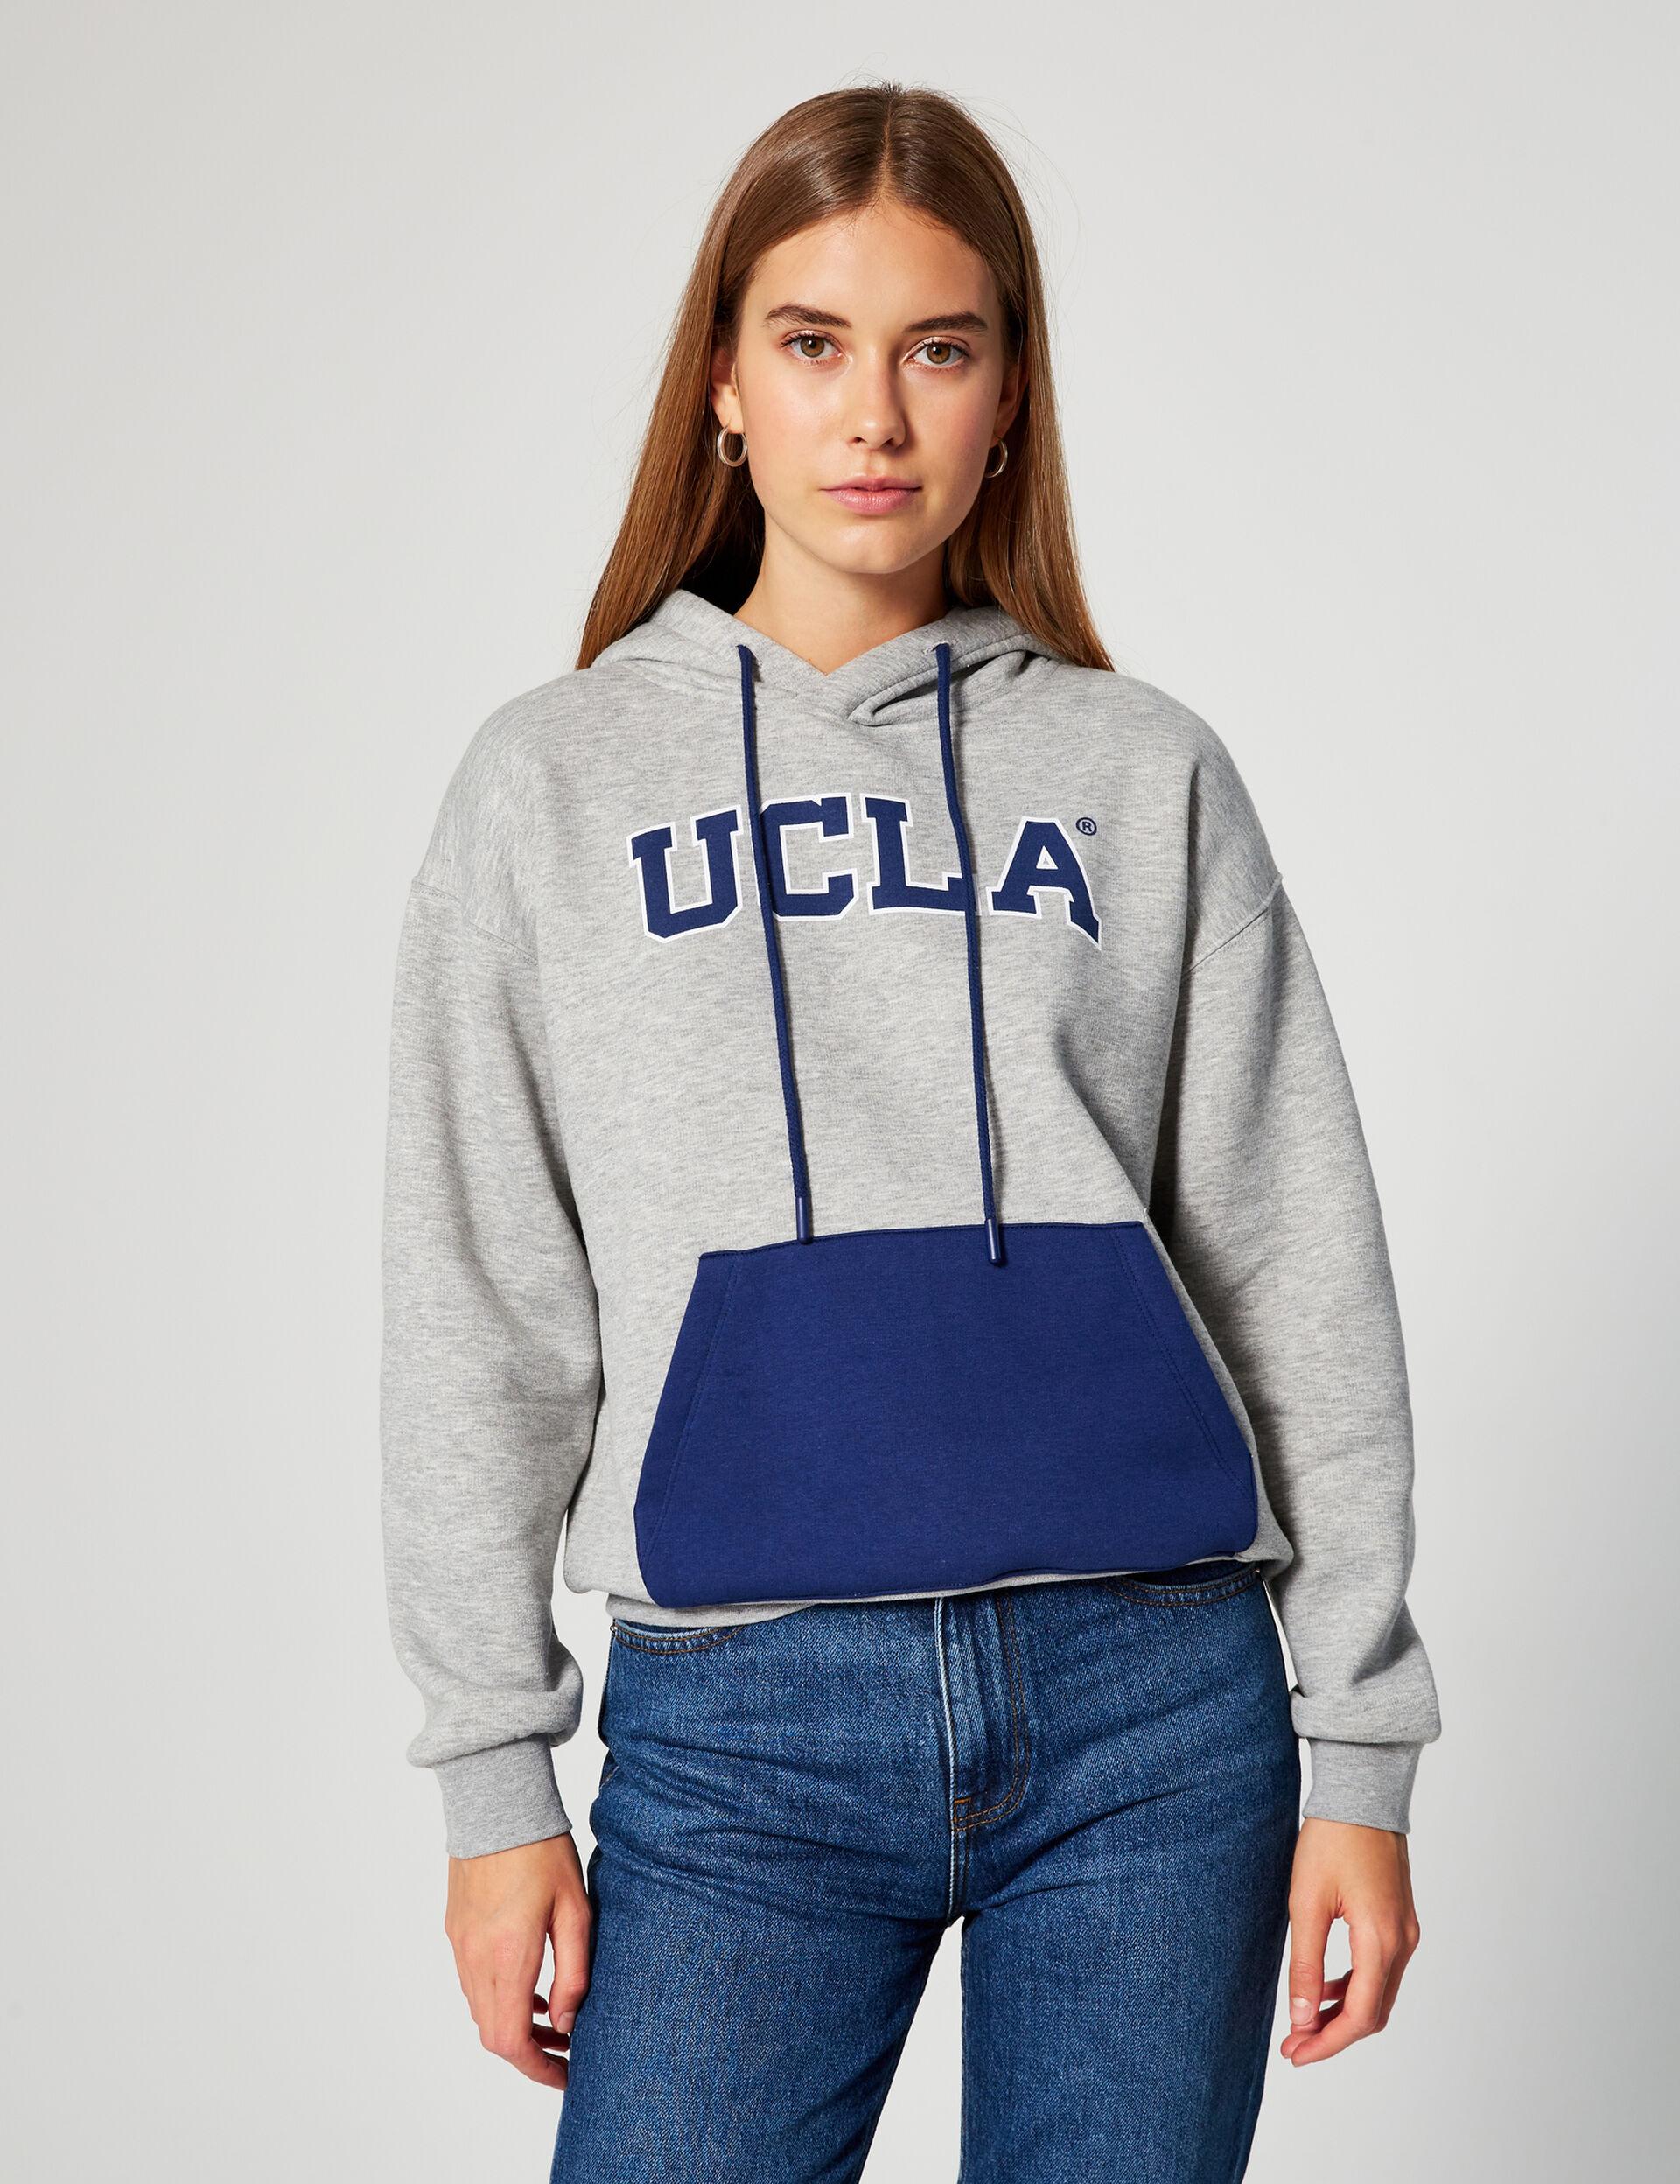 UCLA hoodie